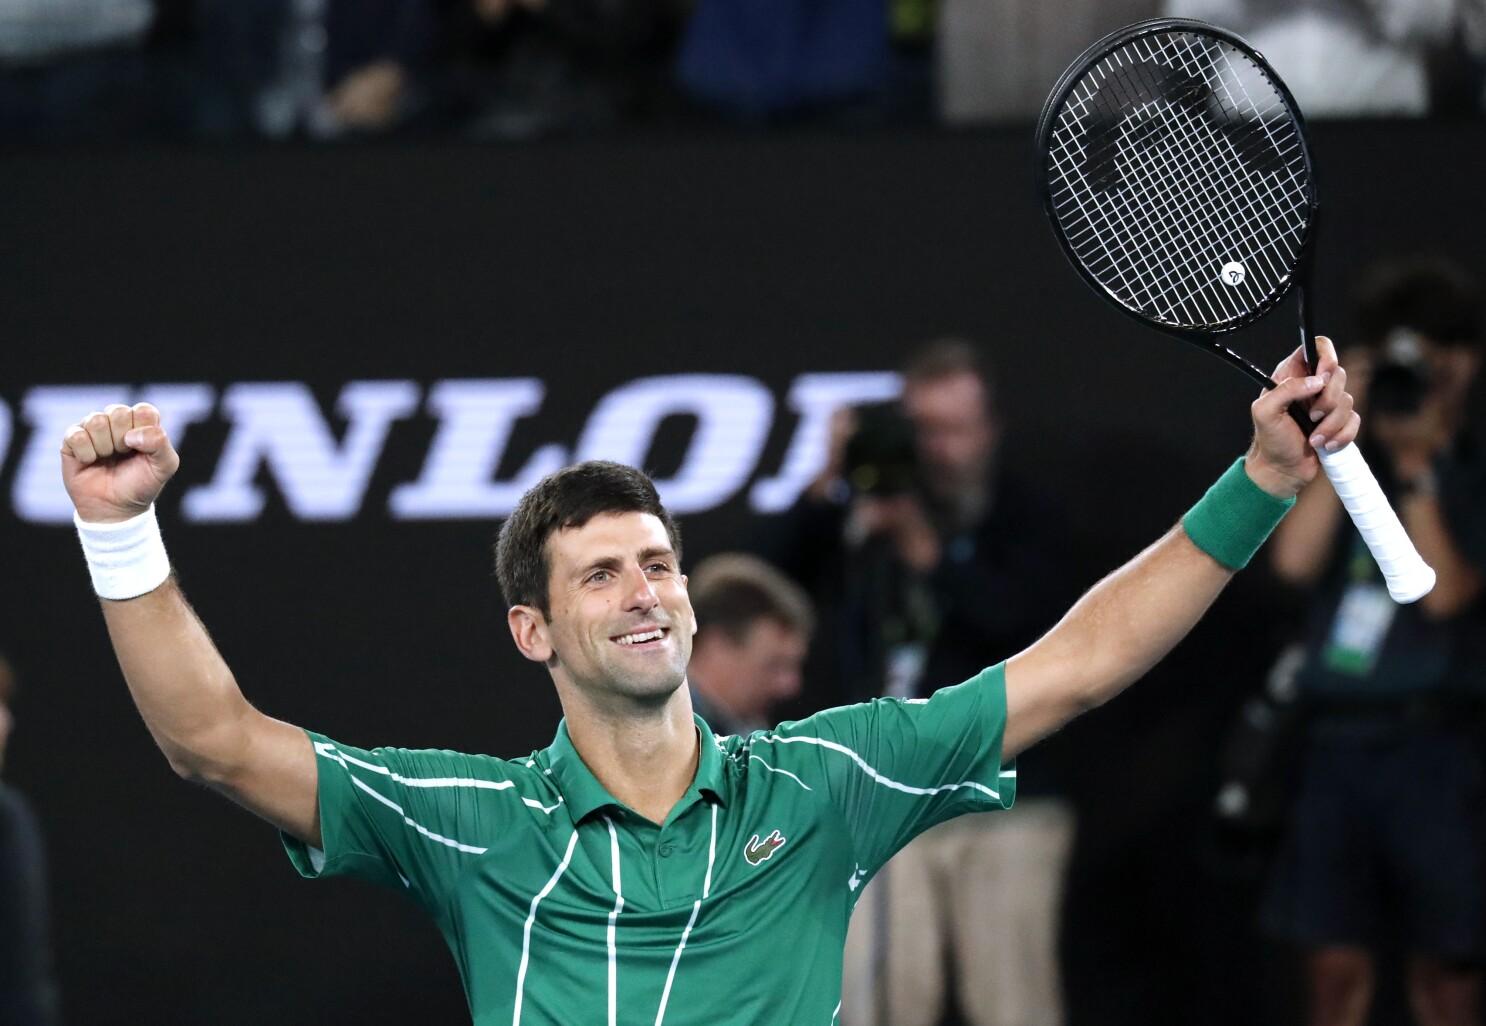 Australian Open Novak Djokovic Comes Back For 8th Title 17th Slam Los Angeles Times